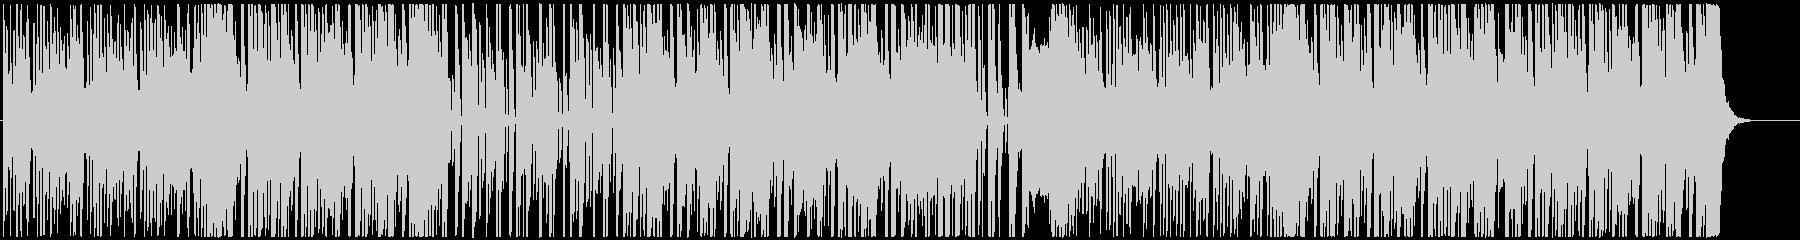 8bit chiptune R&Bの未再生の波形